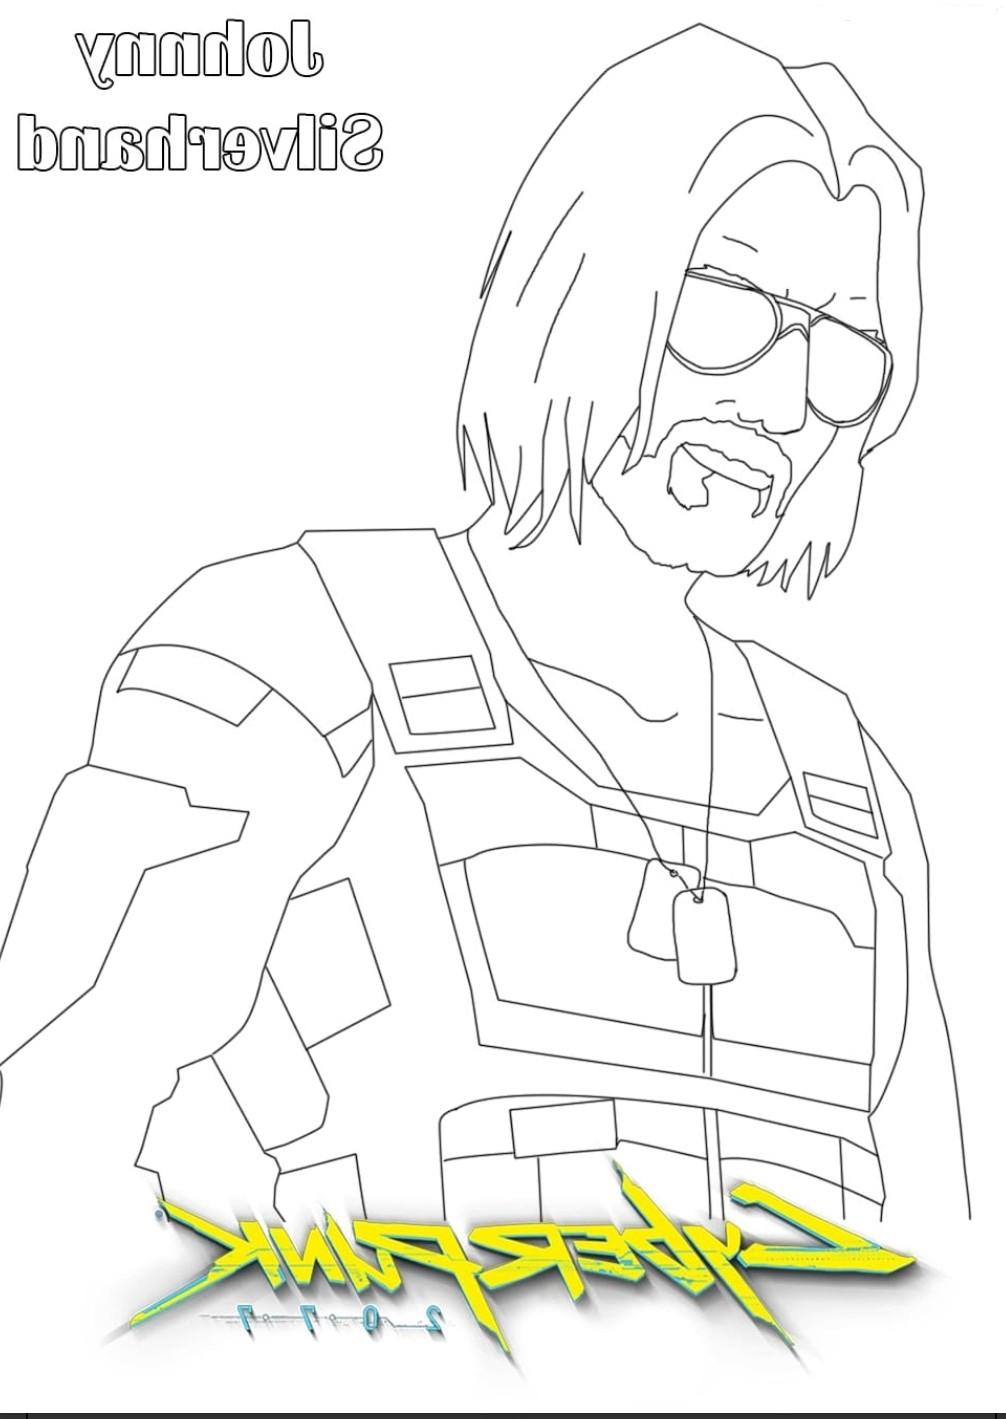 John Silverhand z Cyberpunk 2077 kolorowanka do druku